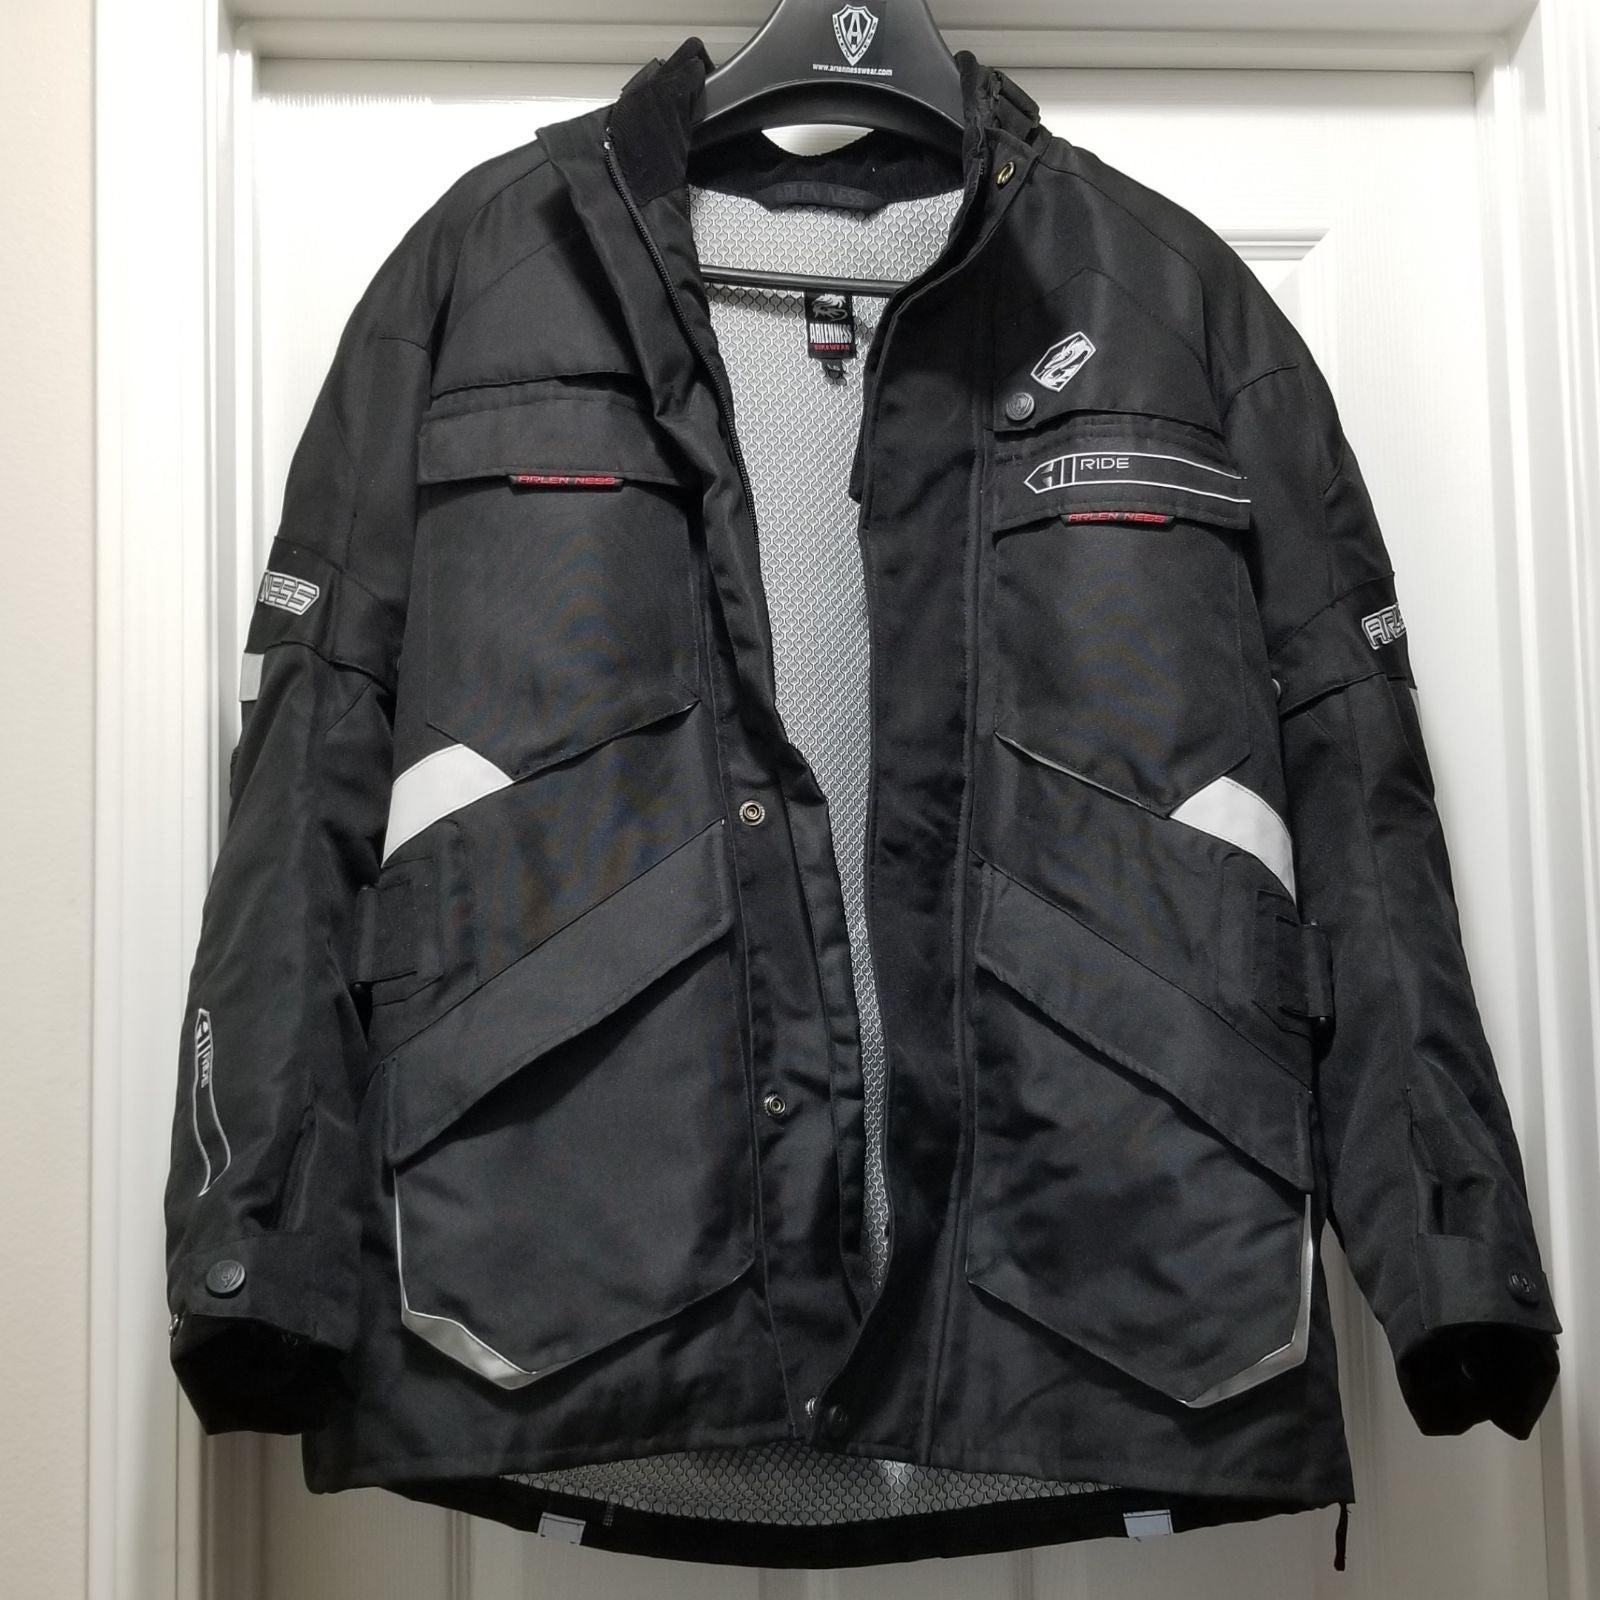 New Arlen Ness Ride Blk Armoured Jacket